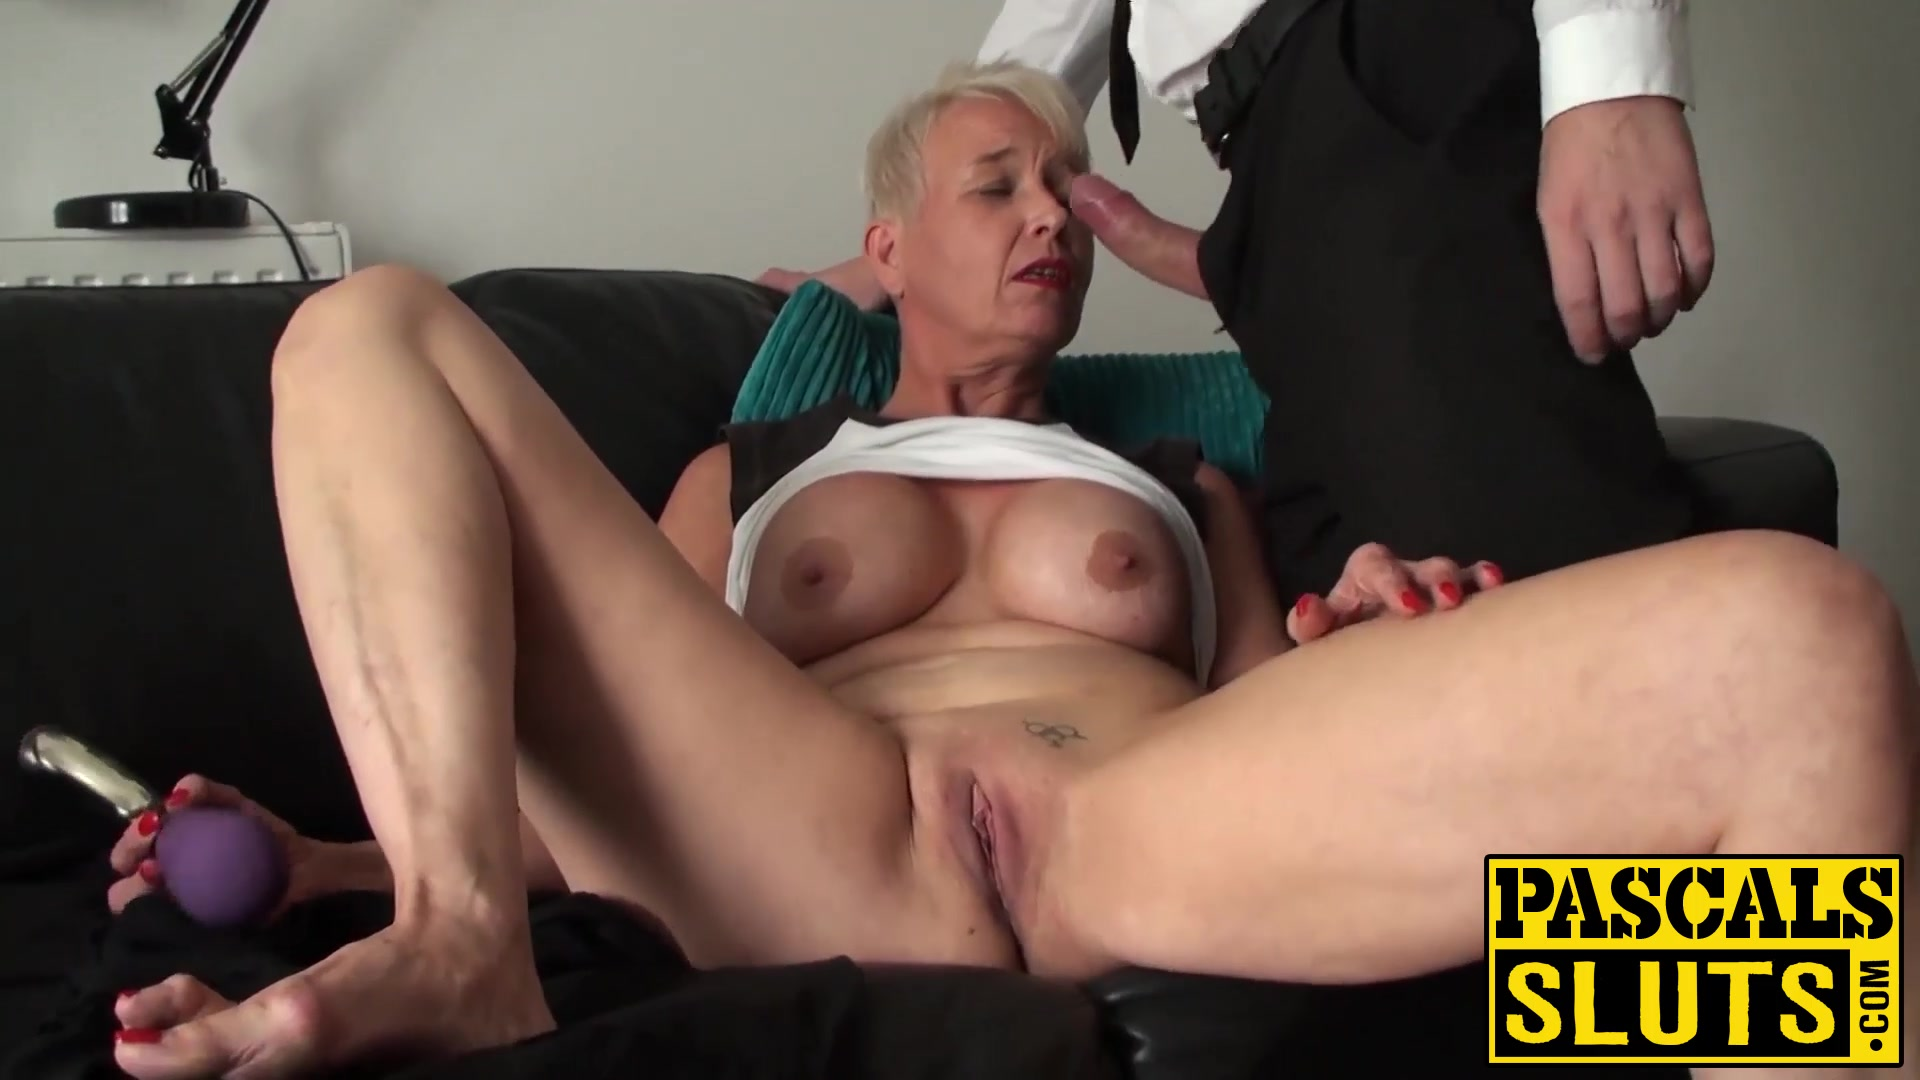 Pron Pictures Bbw sassy anal sex